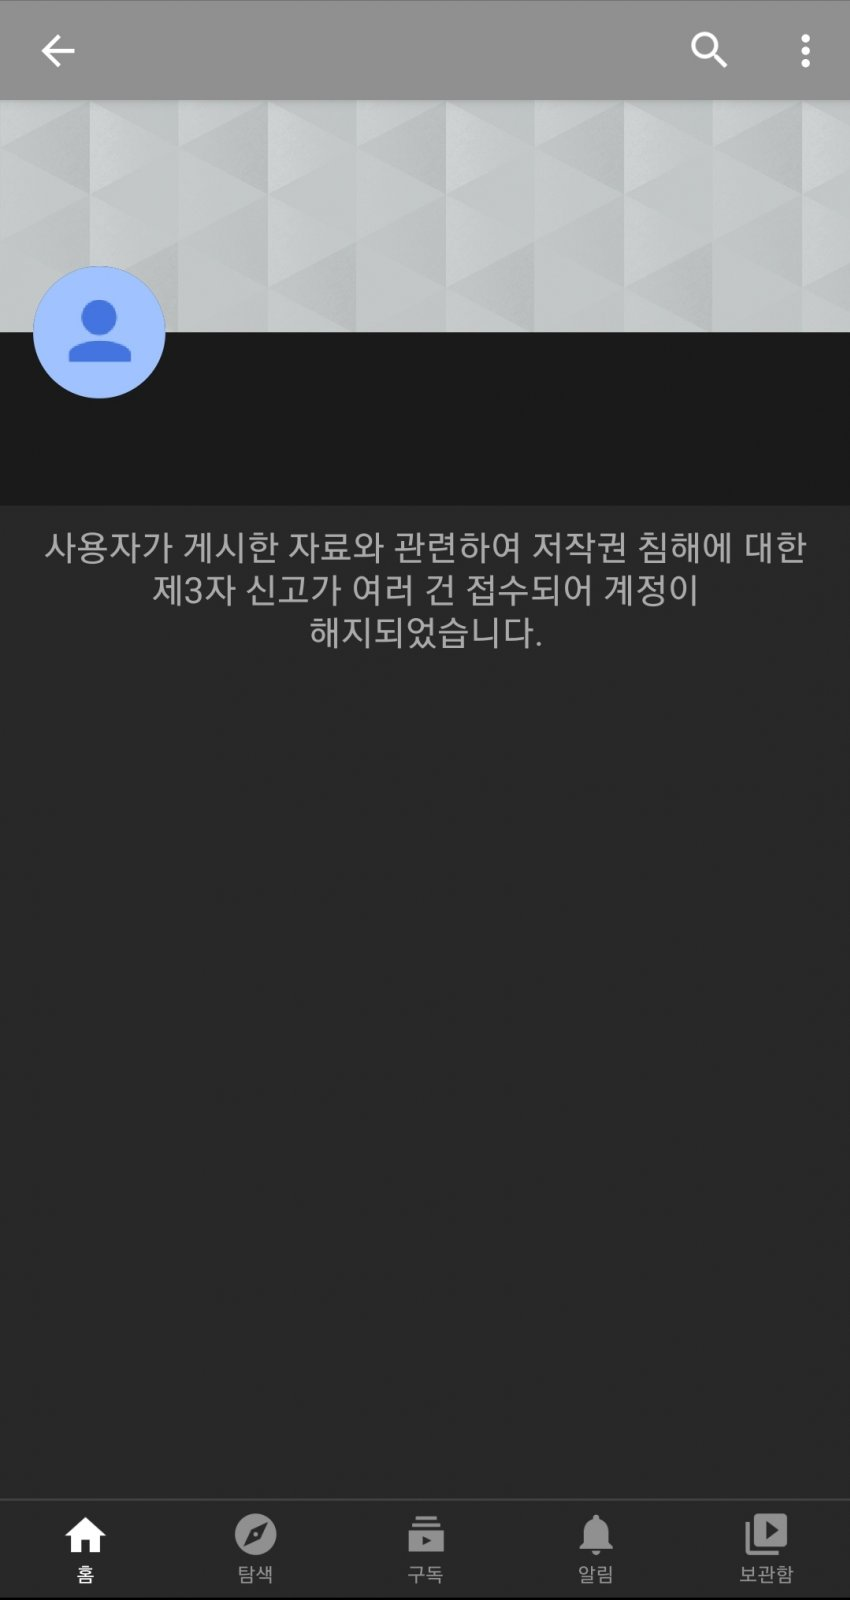 viewimage.php?id=3da8dd36ecc62db6&no=24b0d769e1d32ca73dec87fa11d0283123a3619b5f9530e1a1306968e3dfca0e435fcee4970d21d11f0e6a49b8a6c2db9dae042f459026b36a4d92271f4394750407ce52b3eae5409c86d51c06059f0f51e8a8adc6cd299a128e20fb81a08d94c8dbfc7550ef